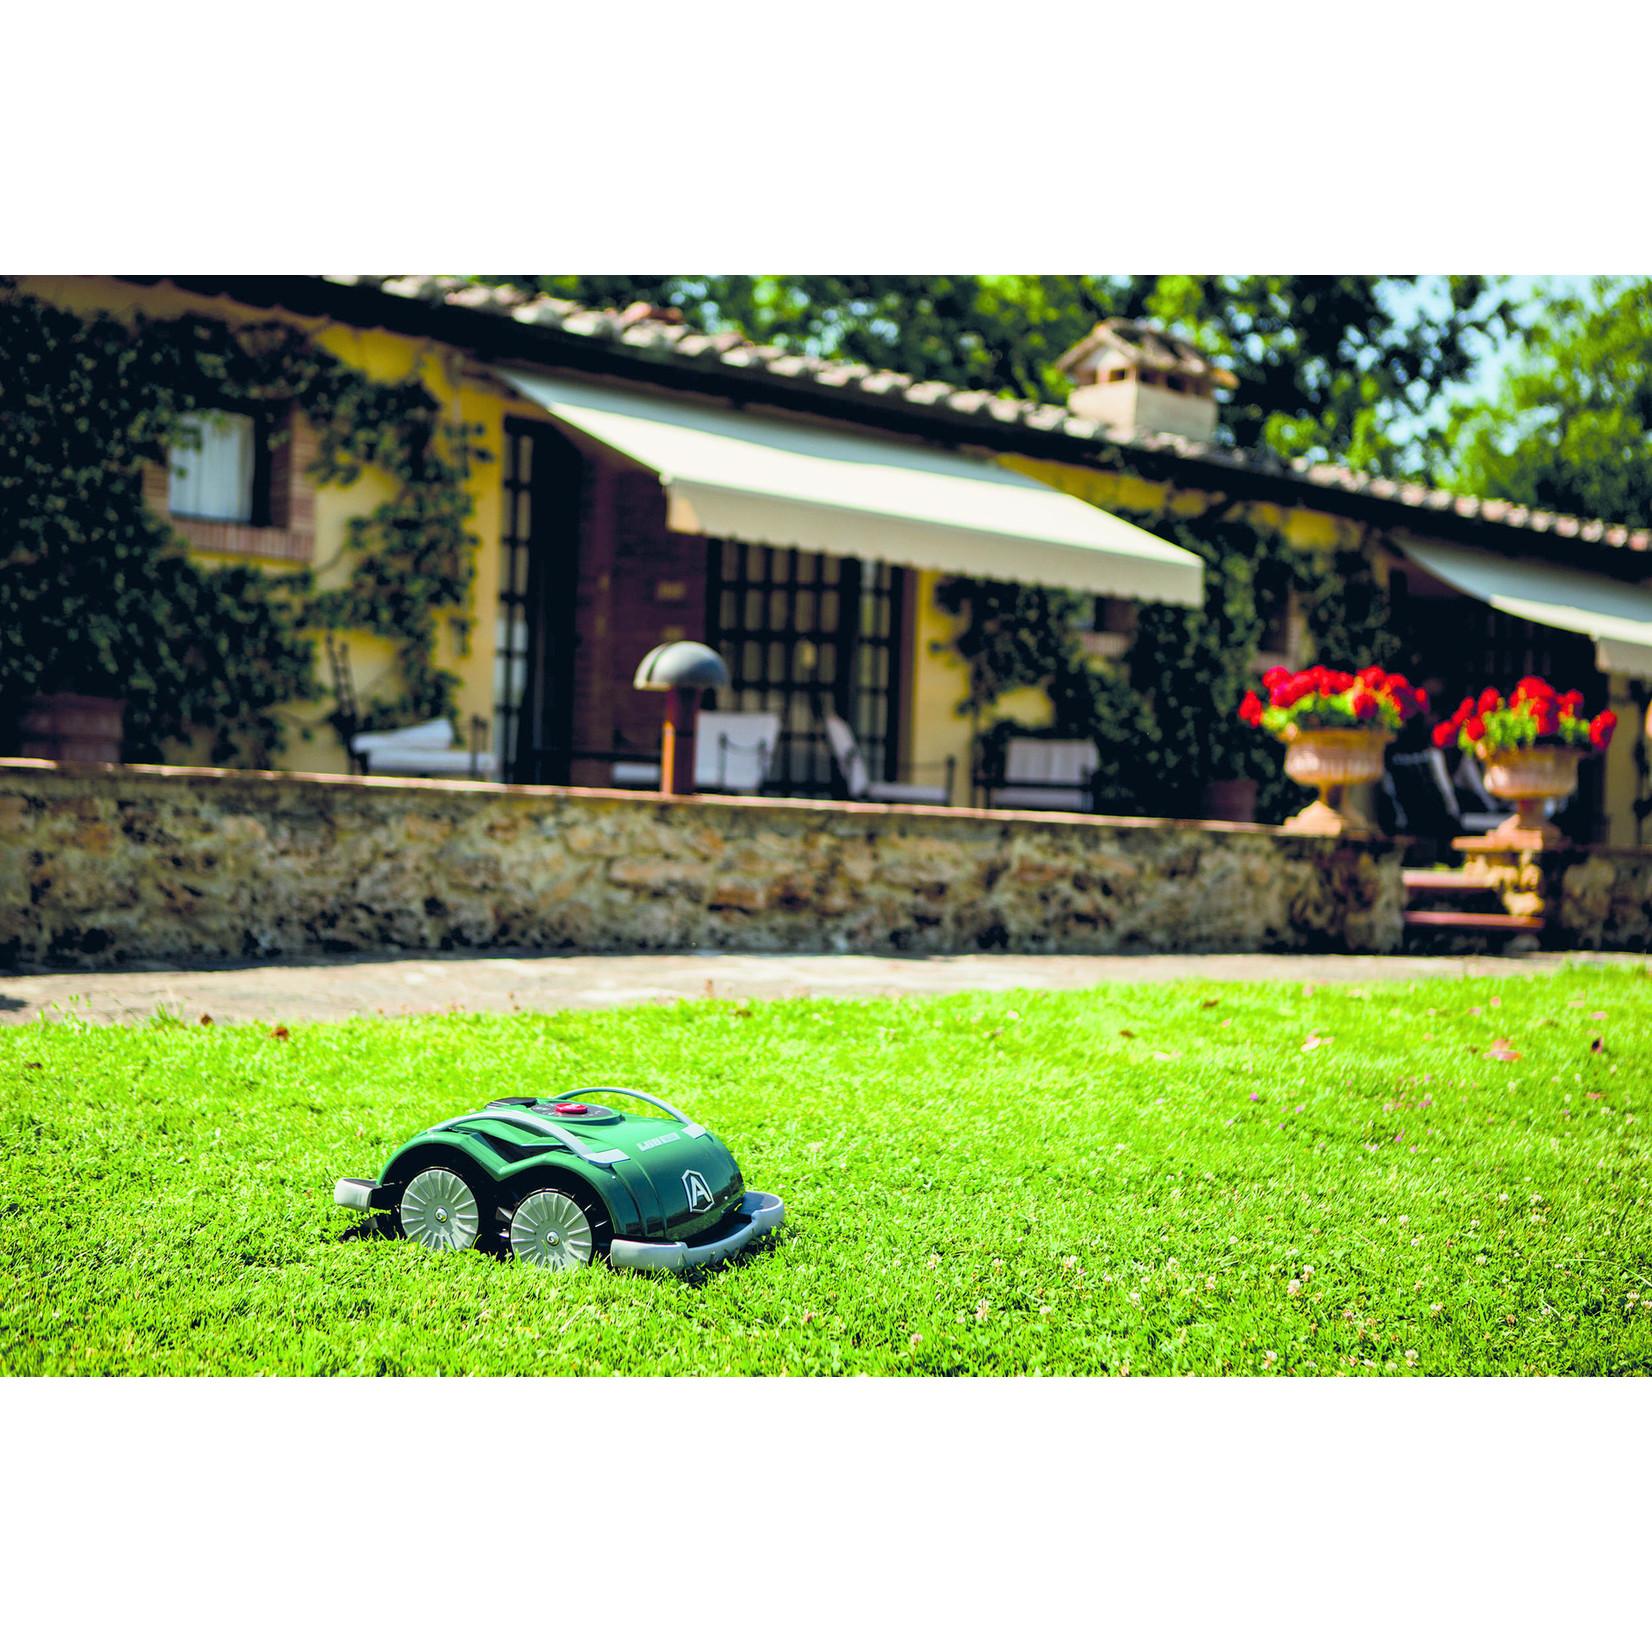 Ambrogio Vorführgerät Ambrogio Greenline L60 Elite S+ Rasenmähroboter Modell 2020